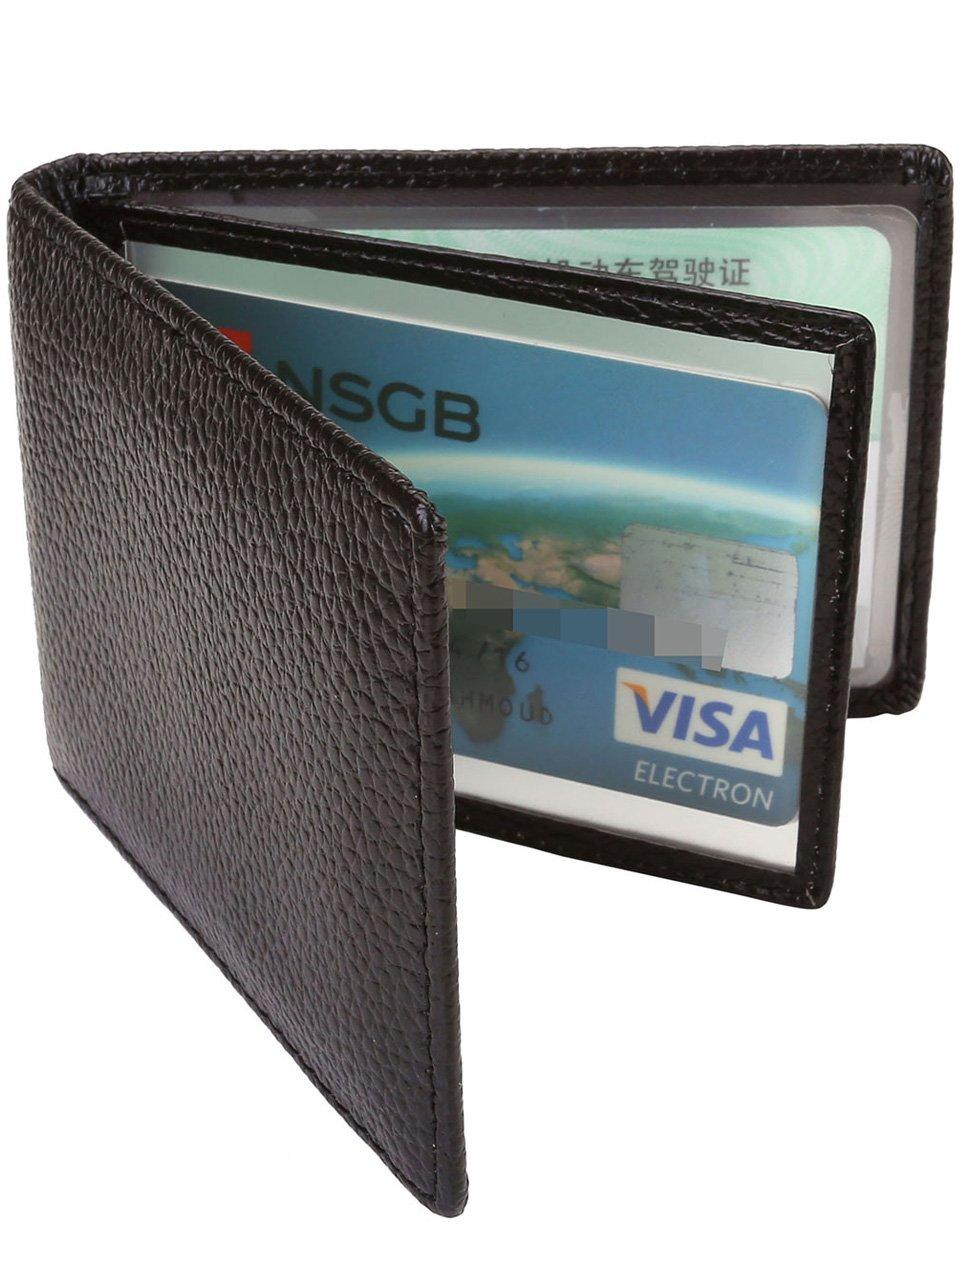 Ayliss RFID Blocking Leather Wallet Slim Minimalist Pocket Wallet Card Holder,Black